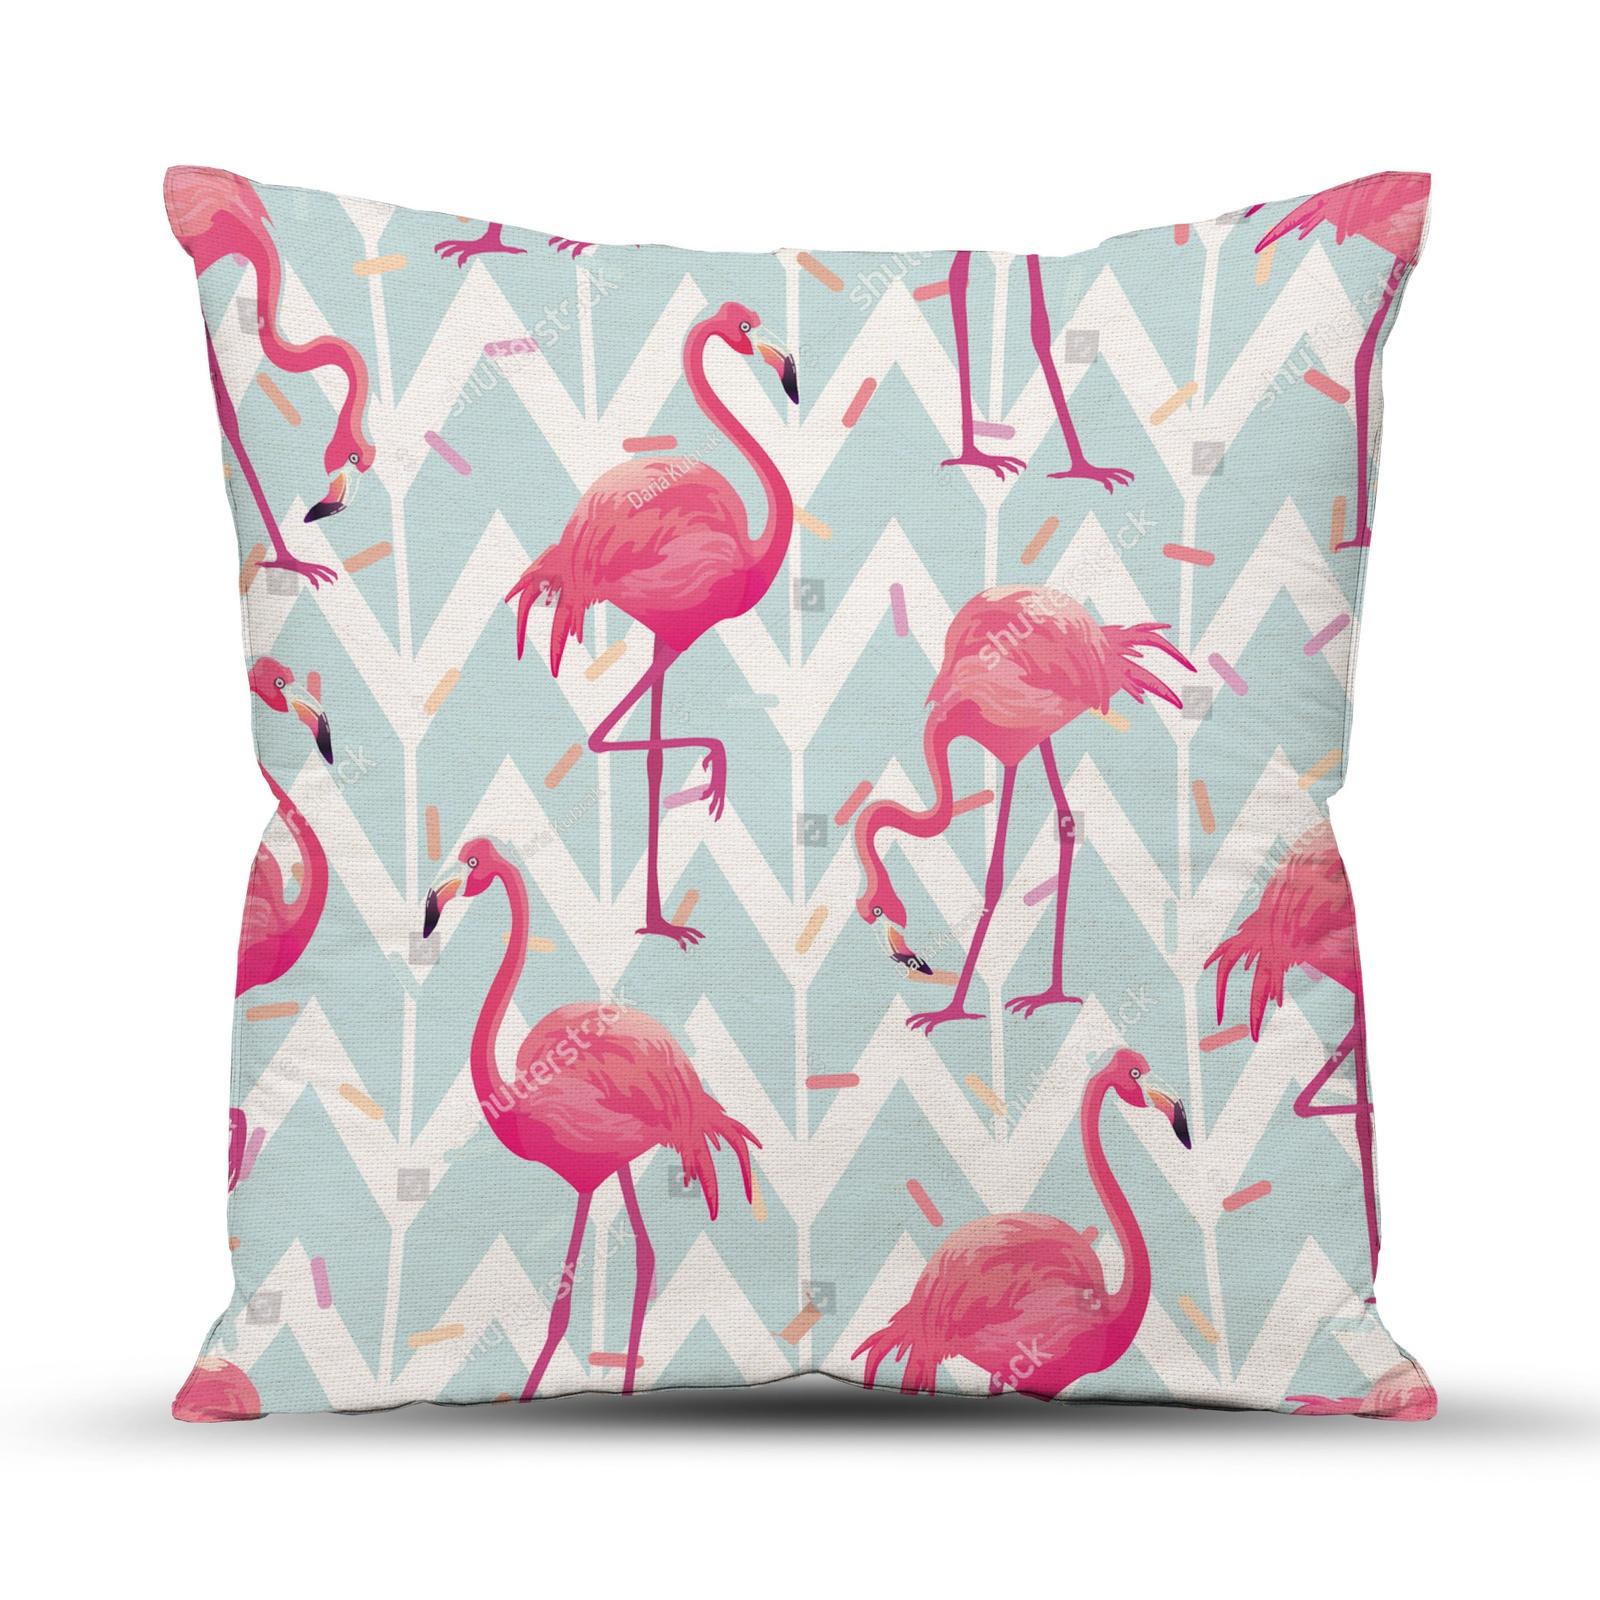 цена на Подушка декоративная ТК Традиция для интерьера, 4052/Фламинго, розовый